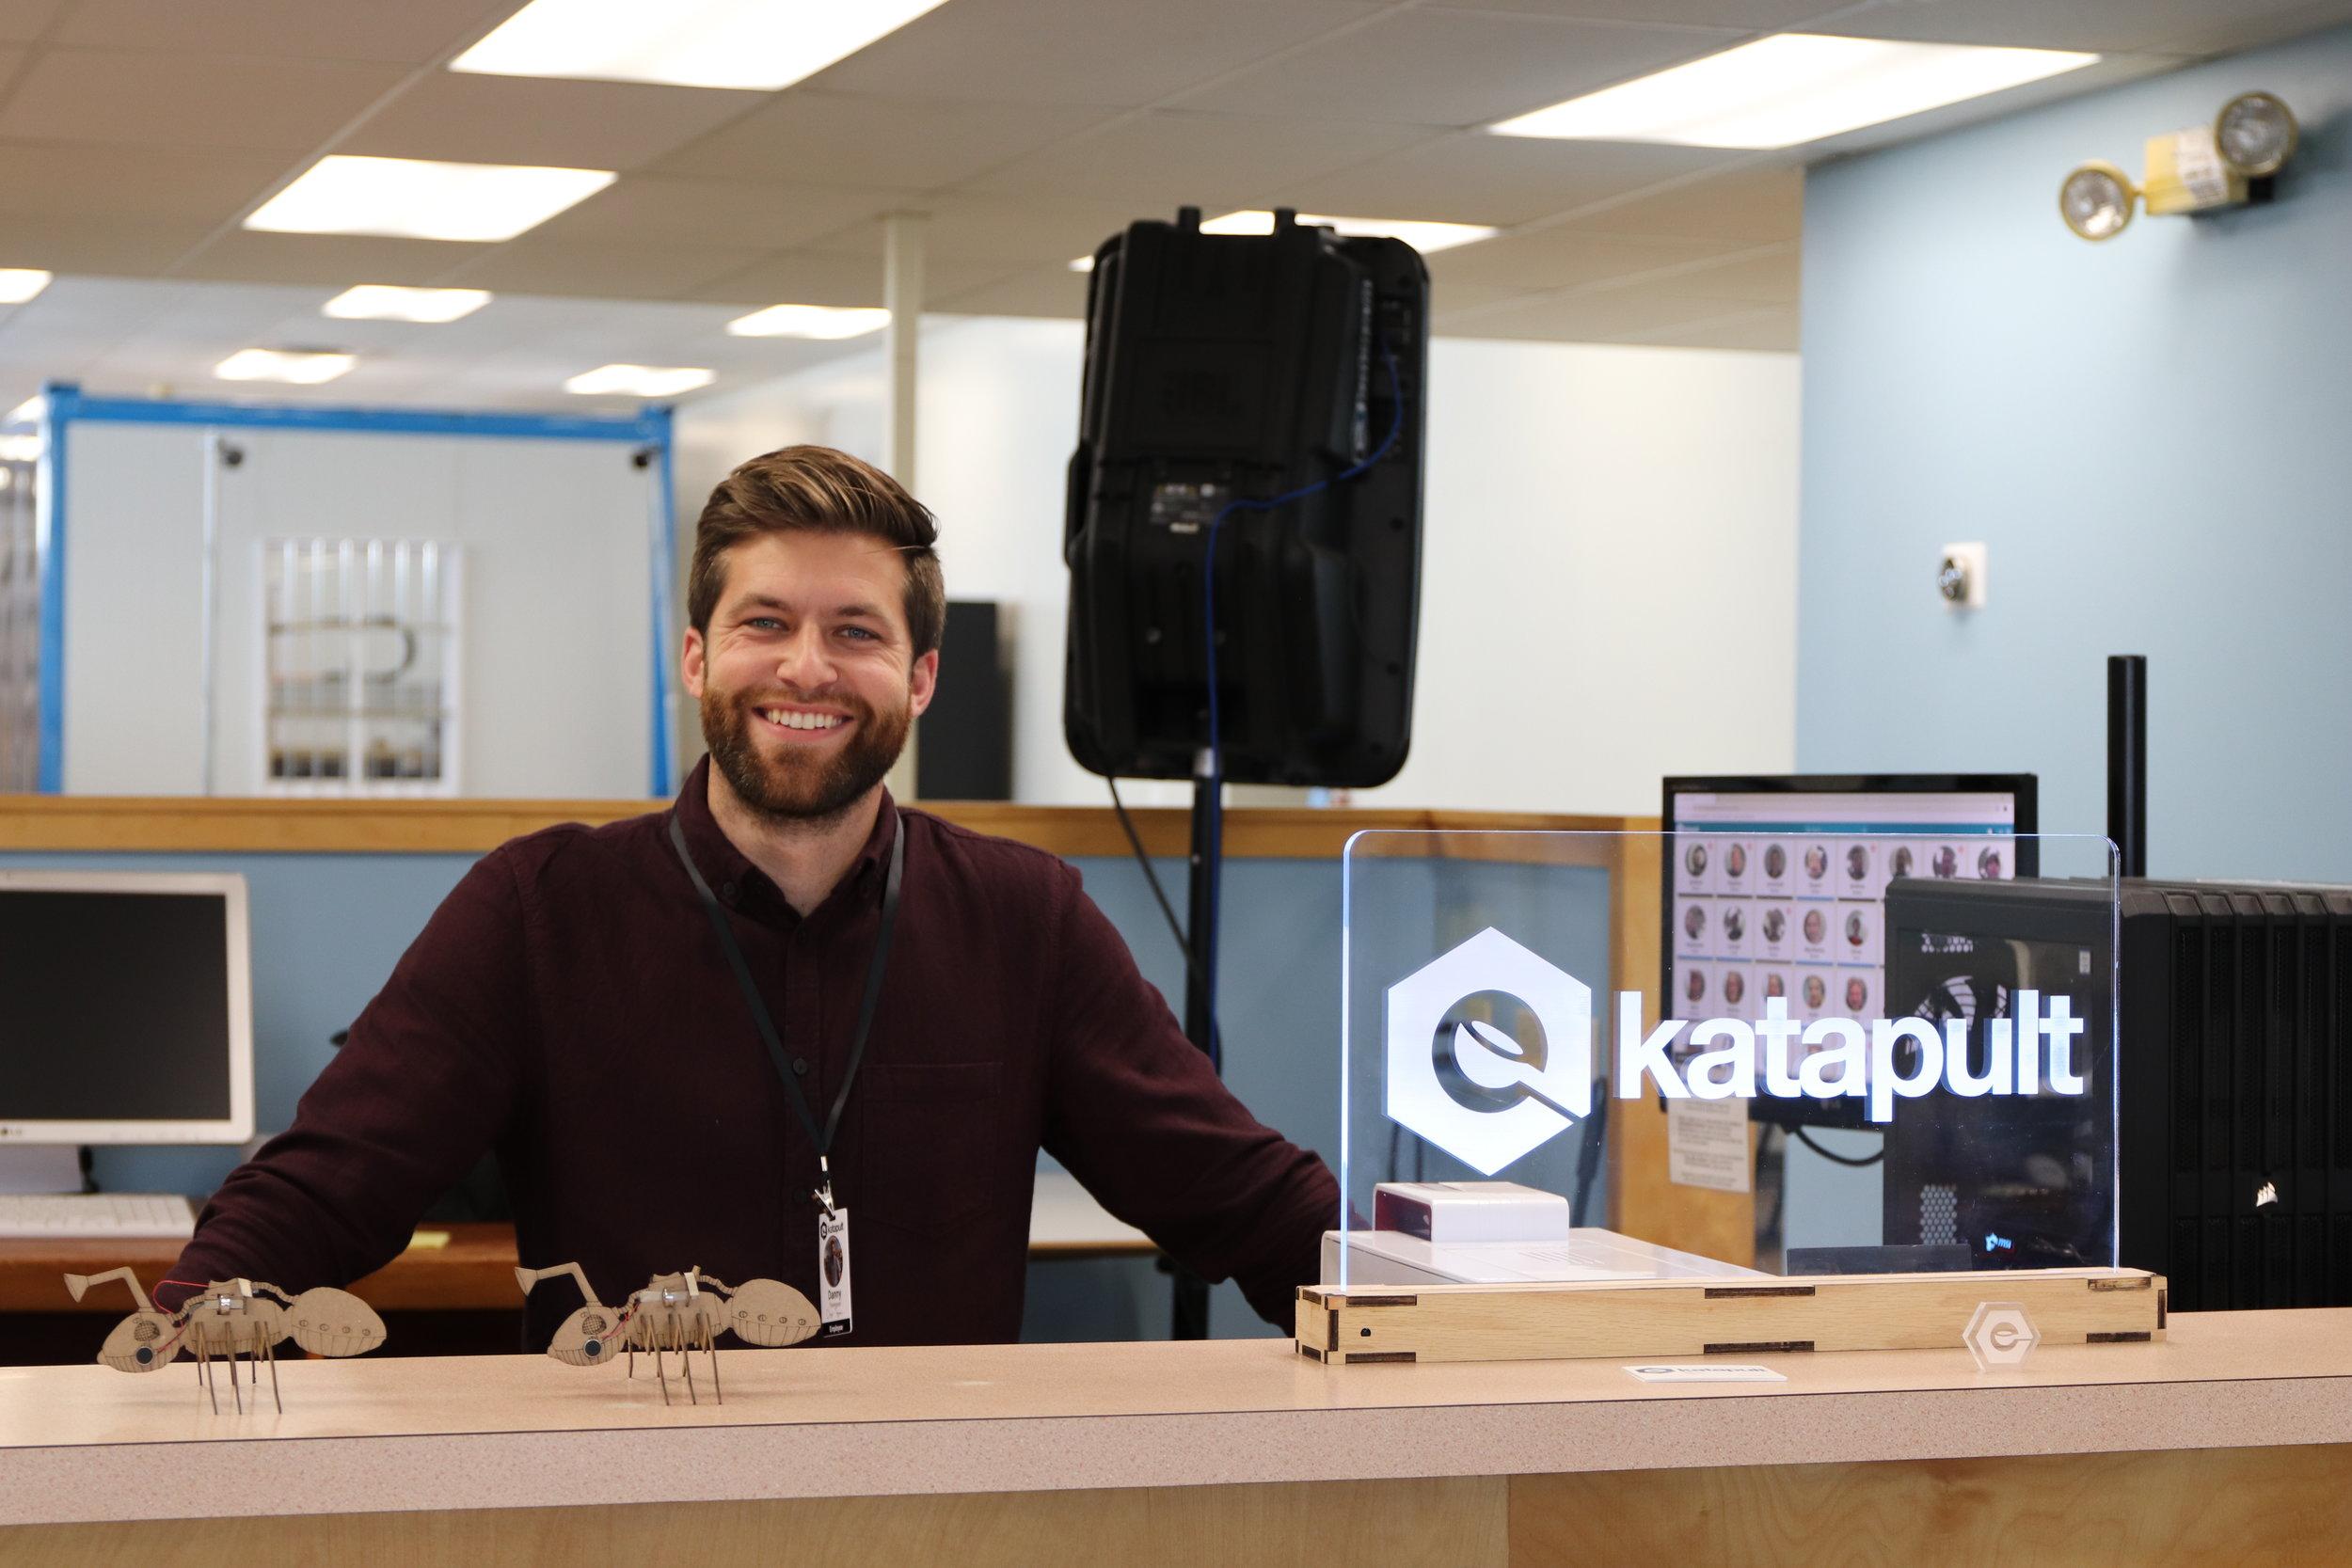 director of KatapultLabs Libratory, Danny Thompson